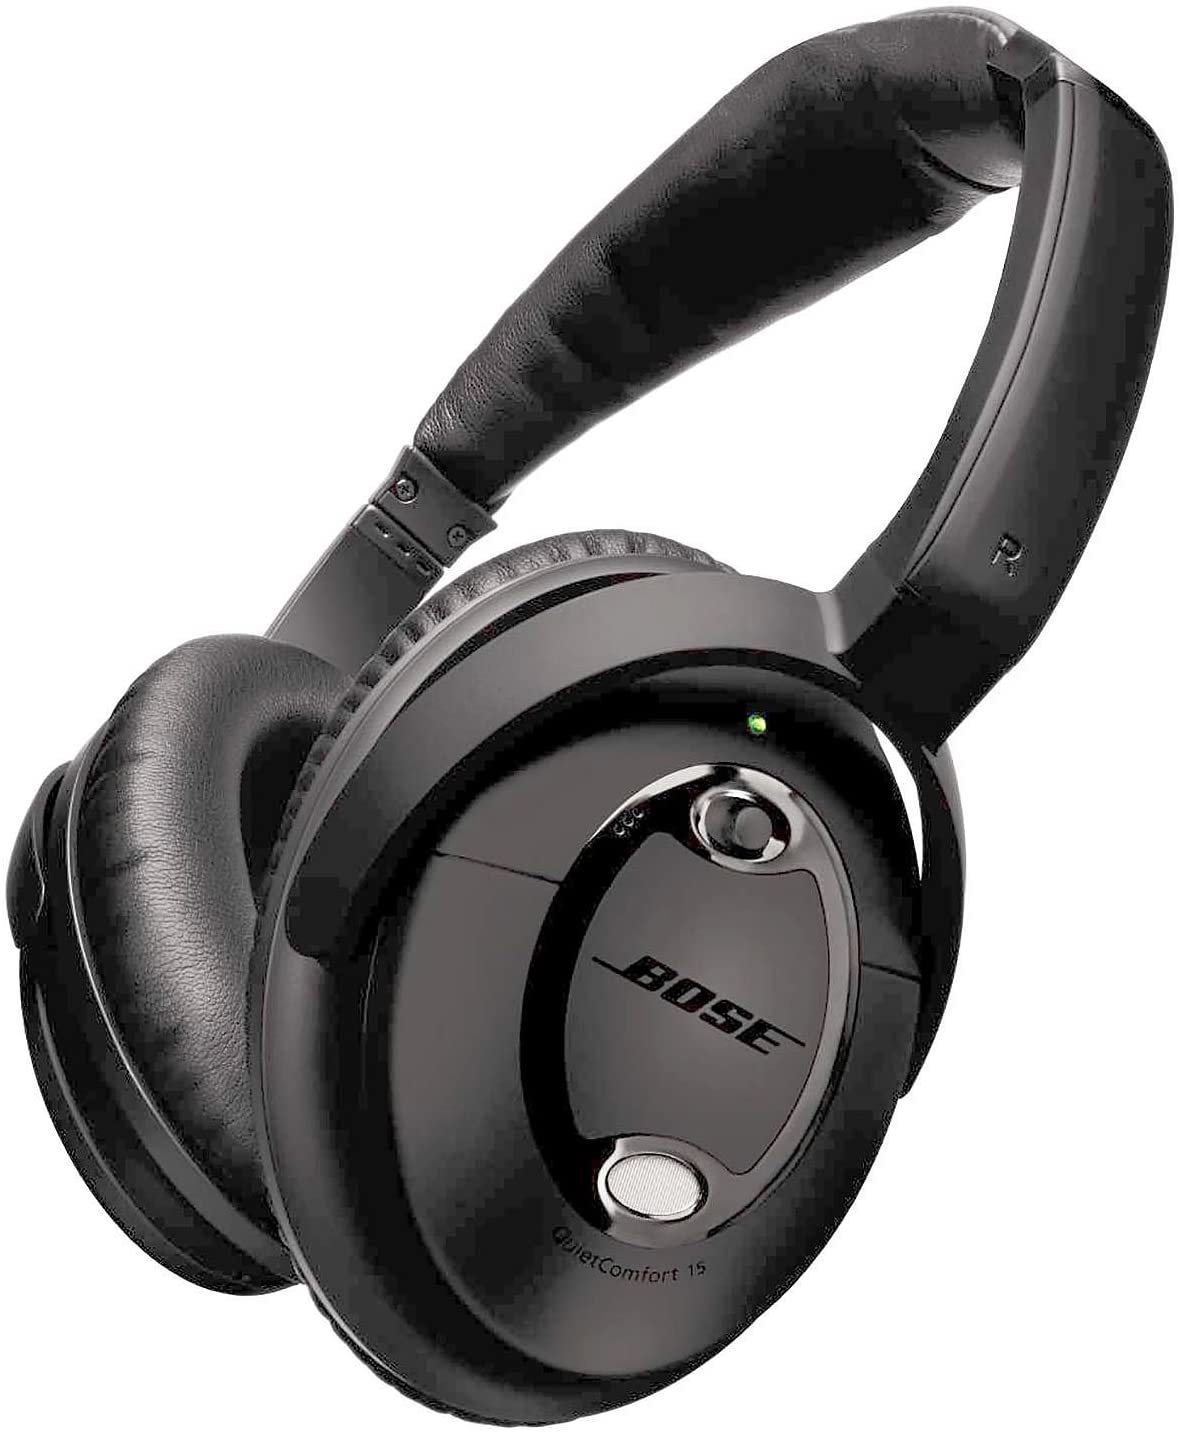 Bose Triple Black QuietComfort 15 Kopfhörer | Headset Test ...